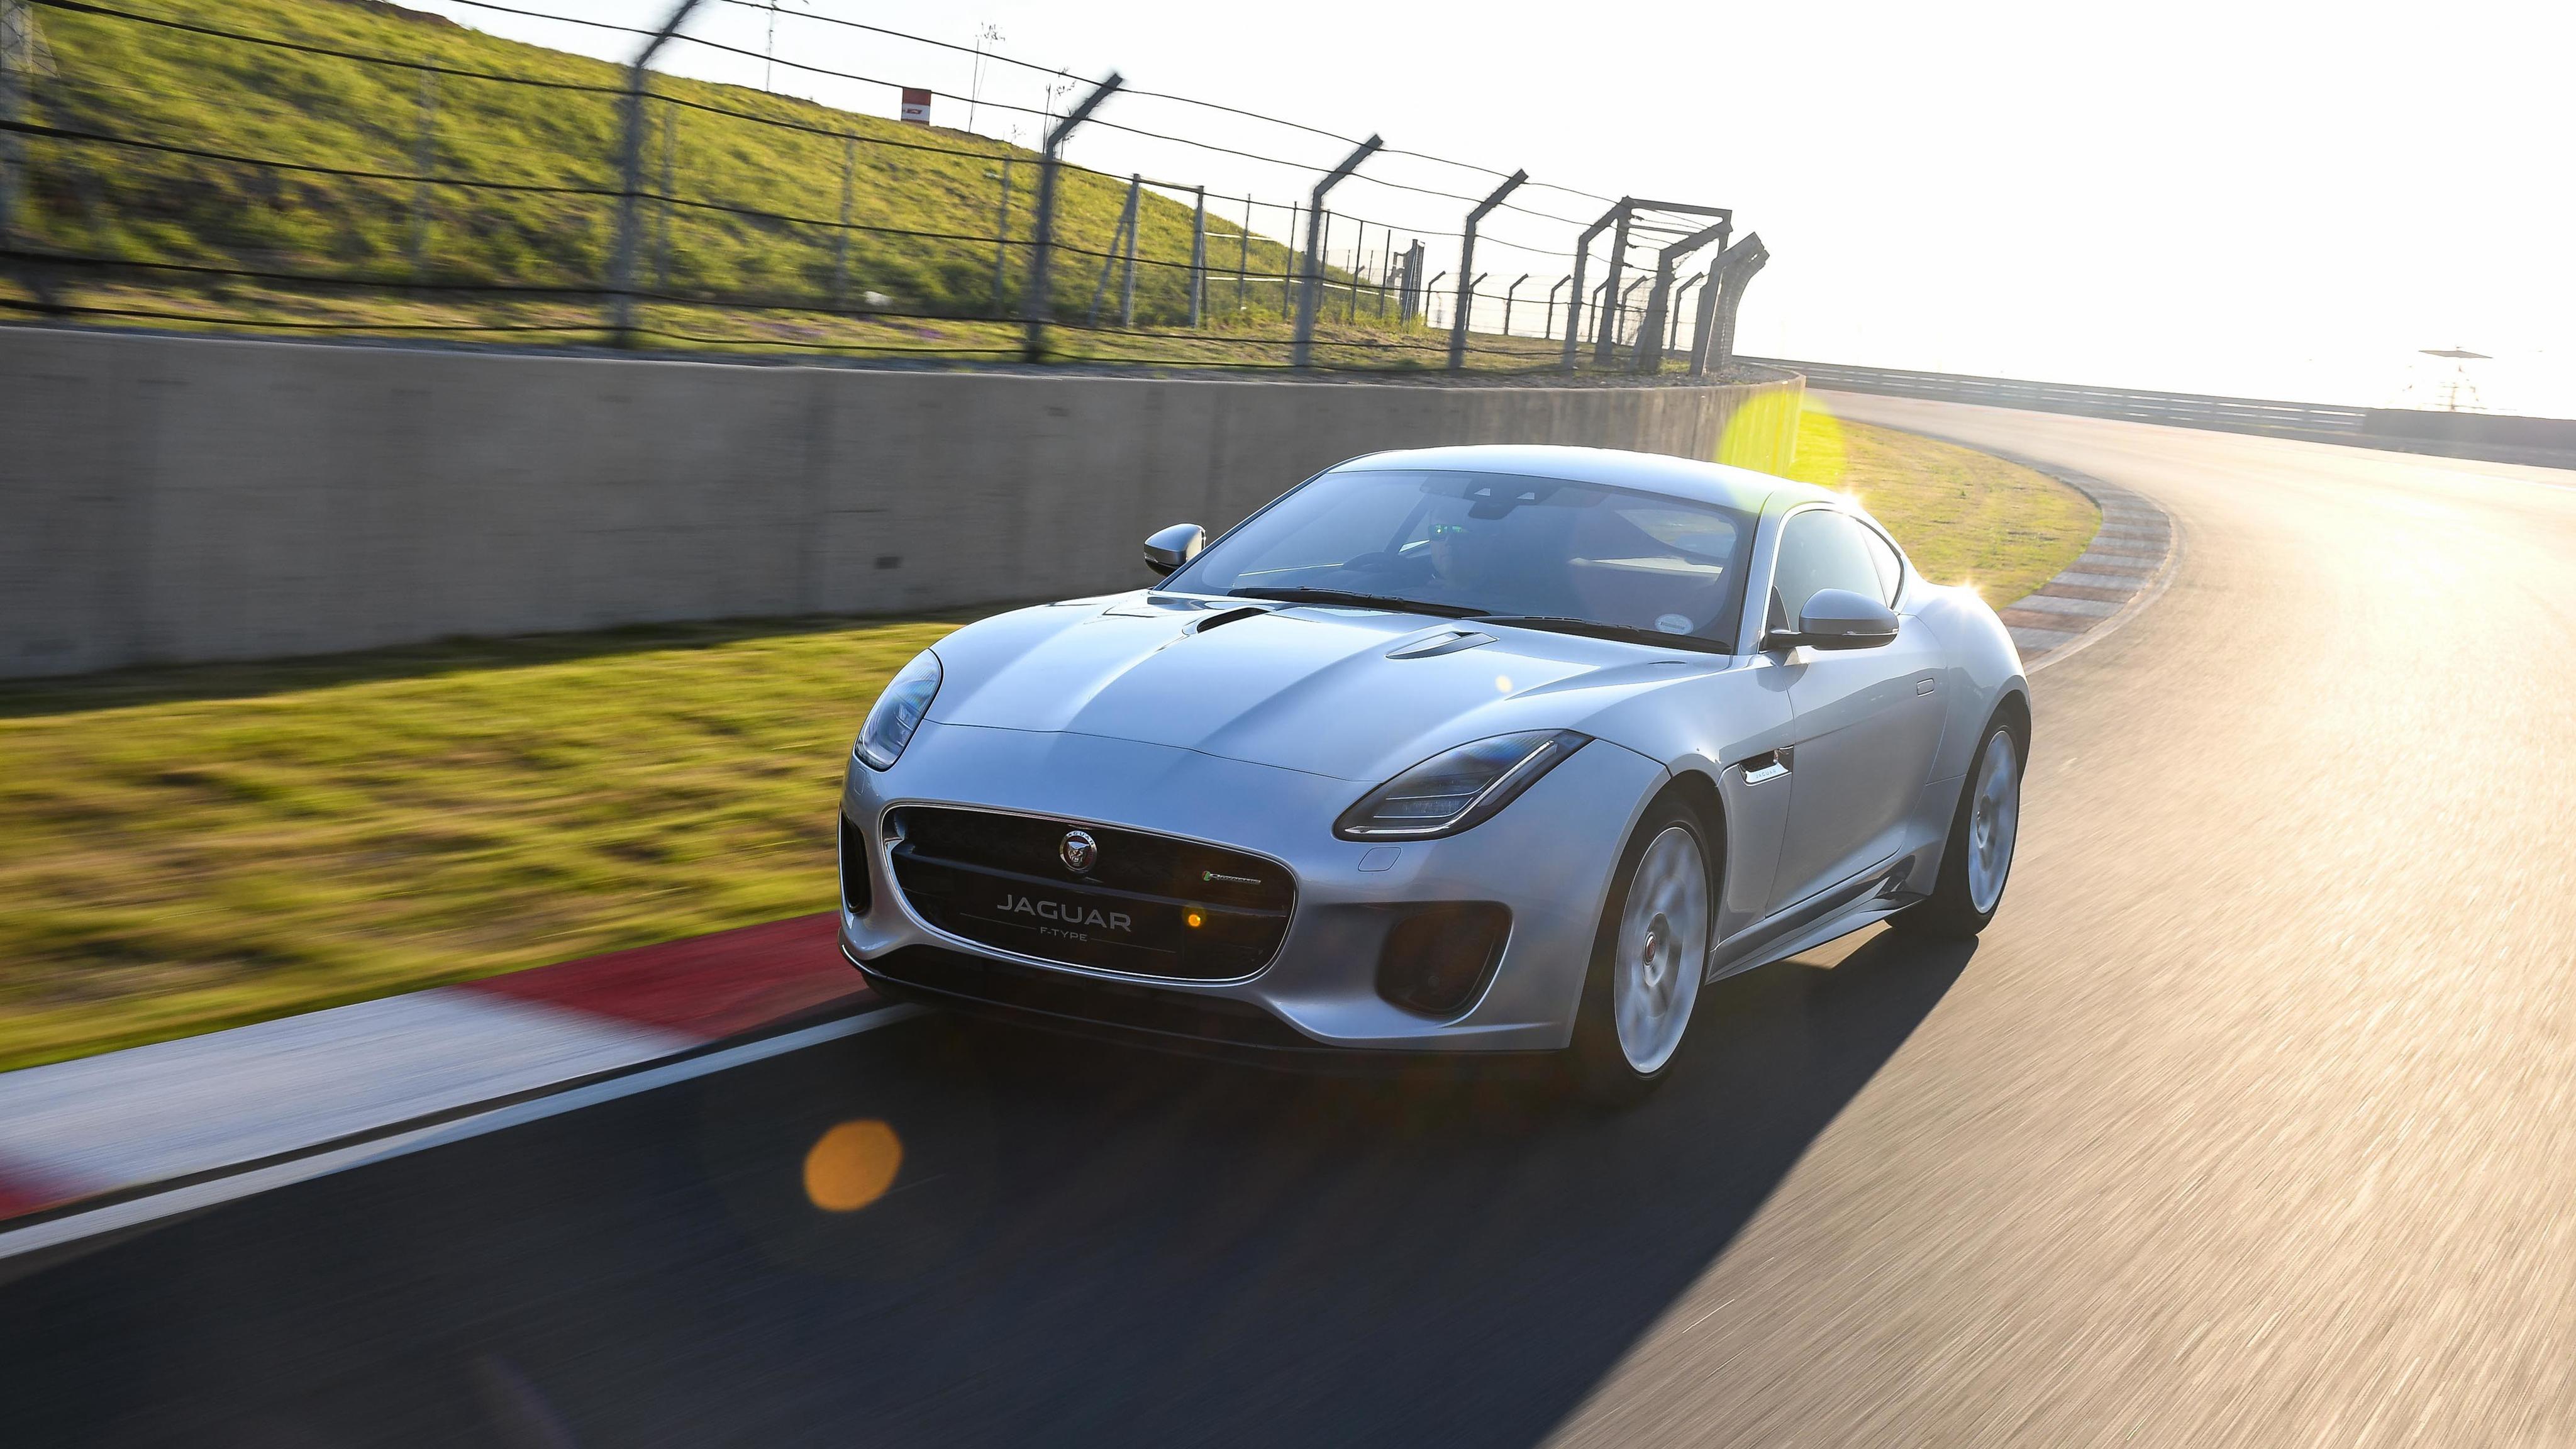 Jaguar F Type 2 Coupe 2017 4K Wallpaper | HD Car ...